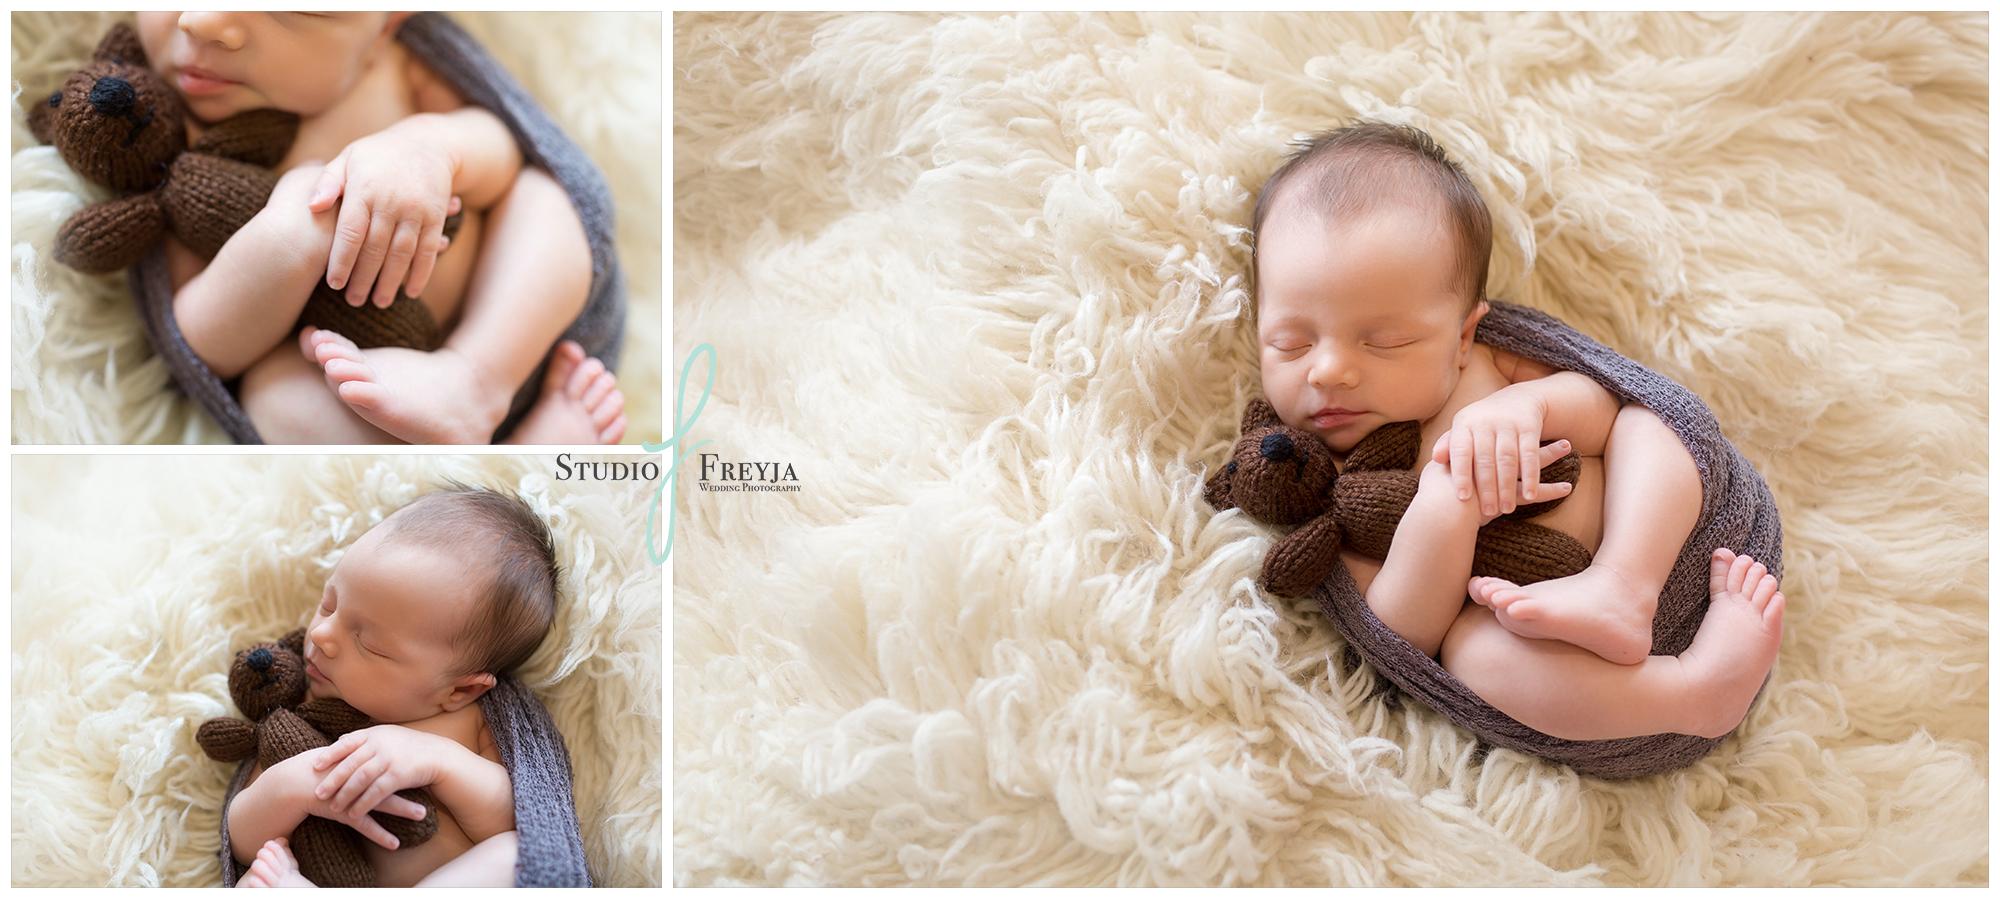 Image Collage by San Diego Newborn Photographer